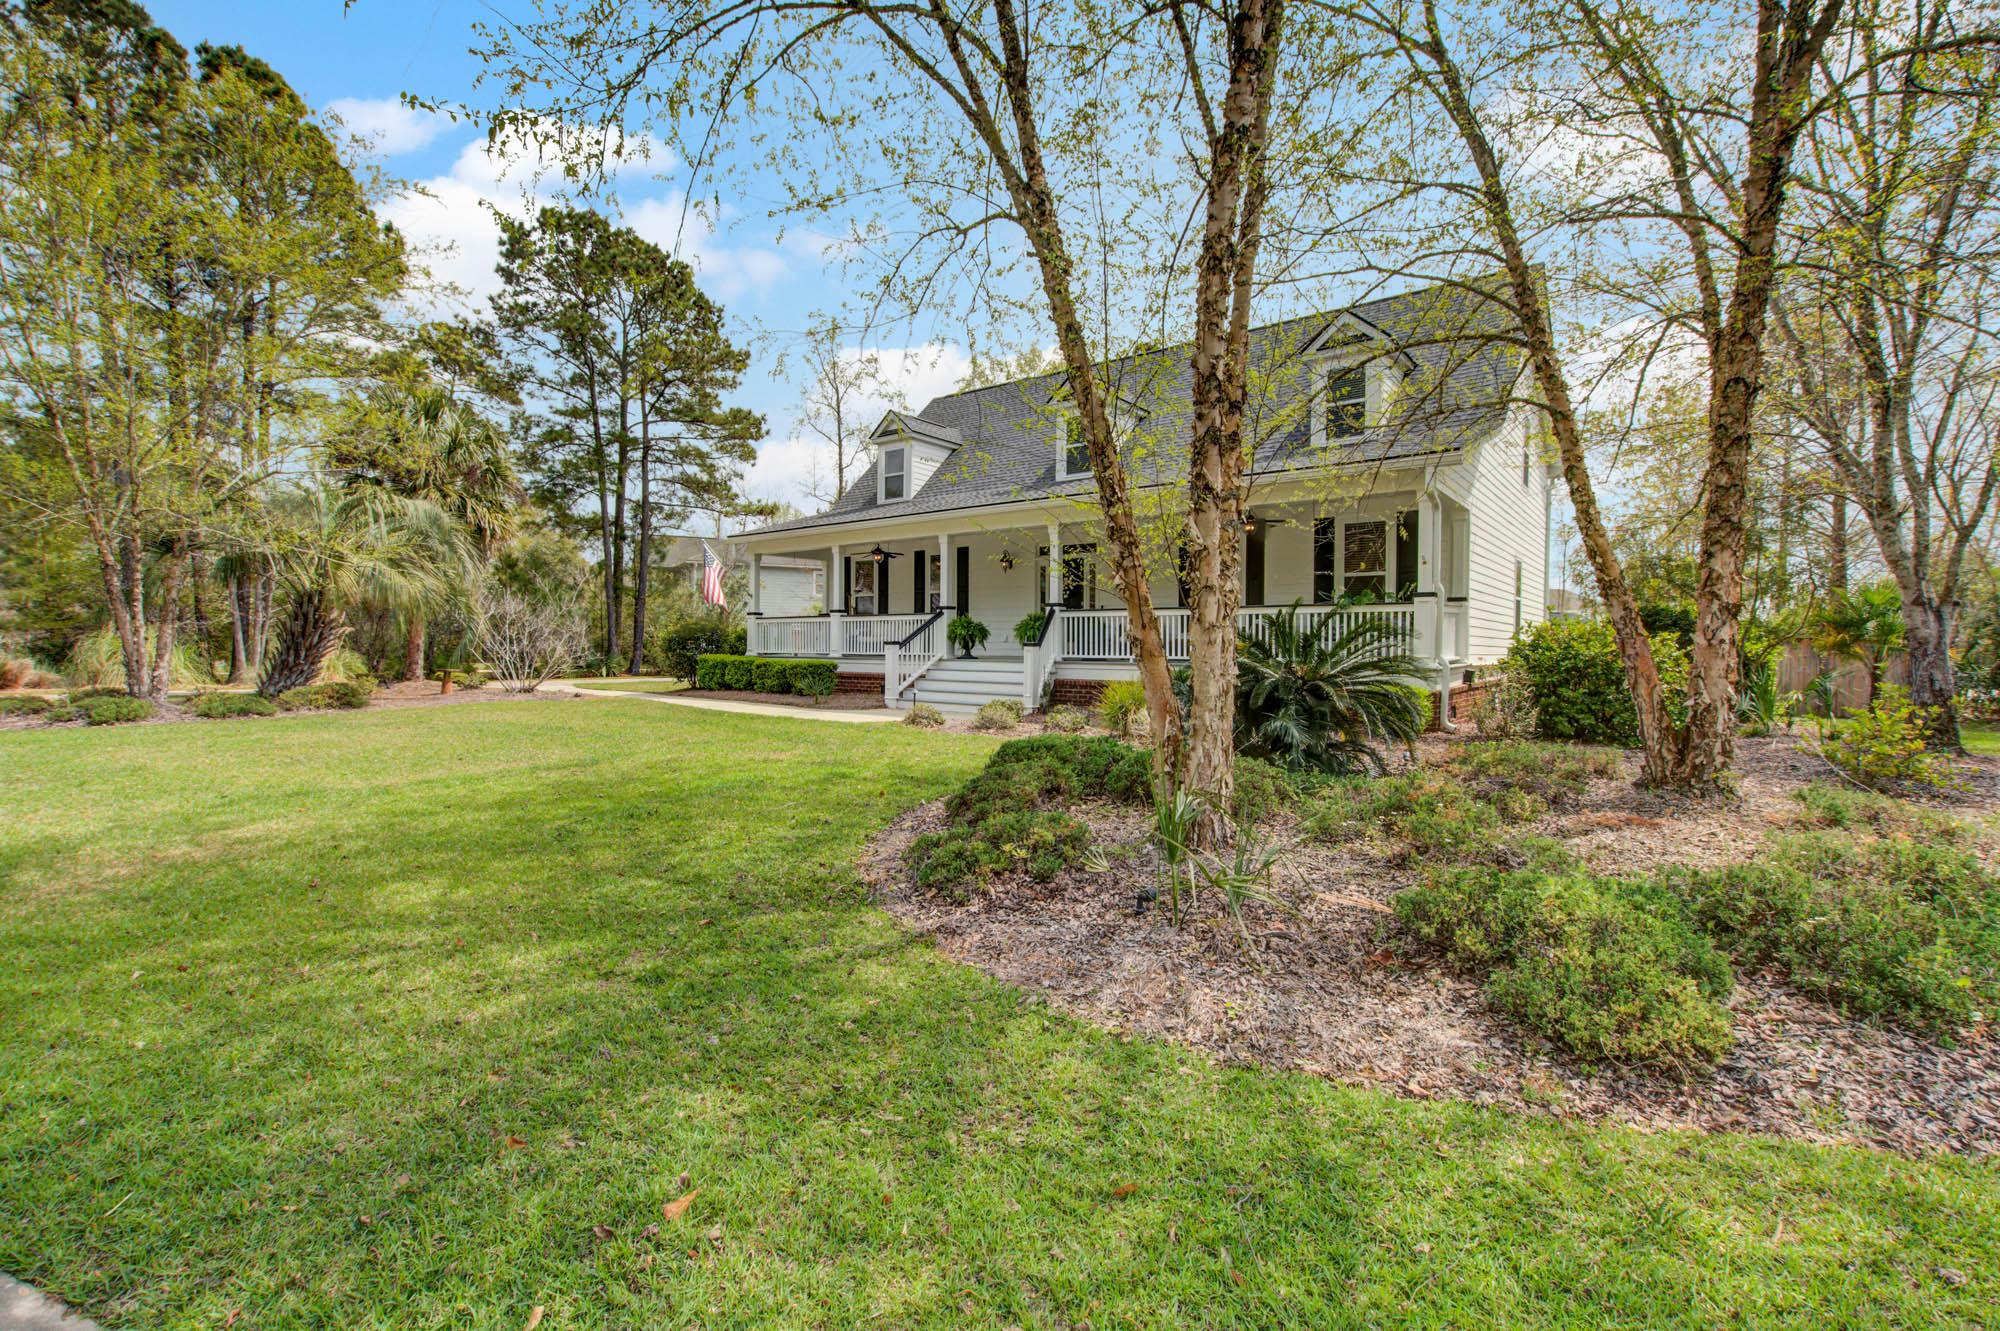 Darrell Creek Homes For Sale - 3783 Saint Ellens, Mount Pleasant, SC - 45